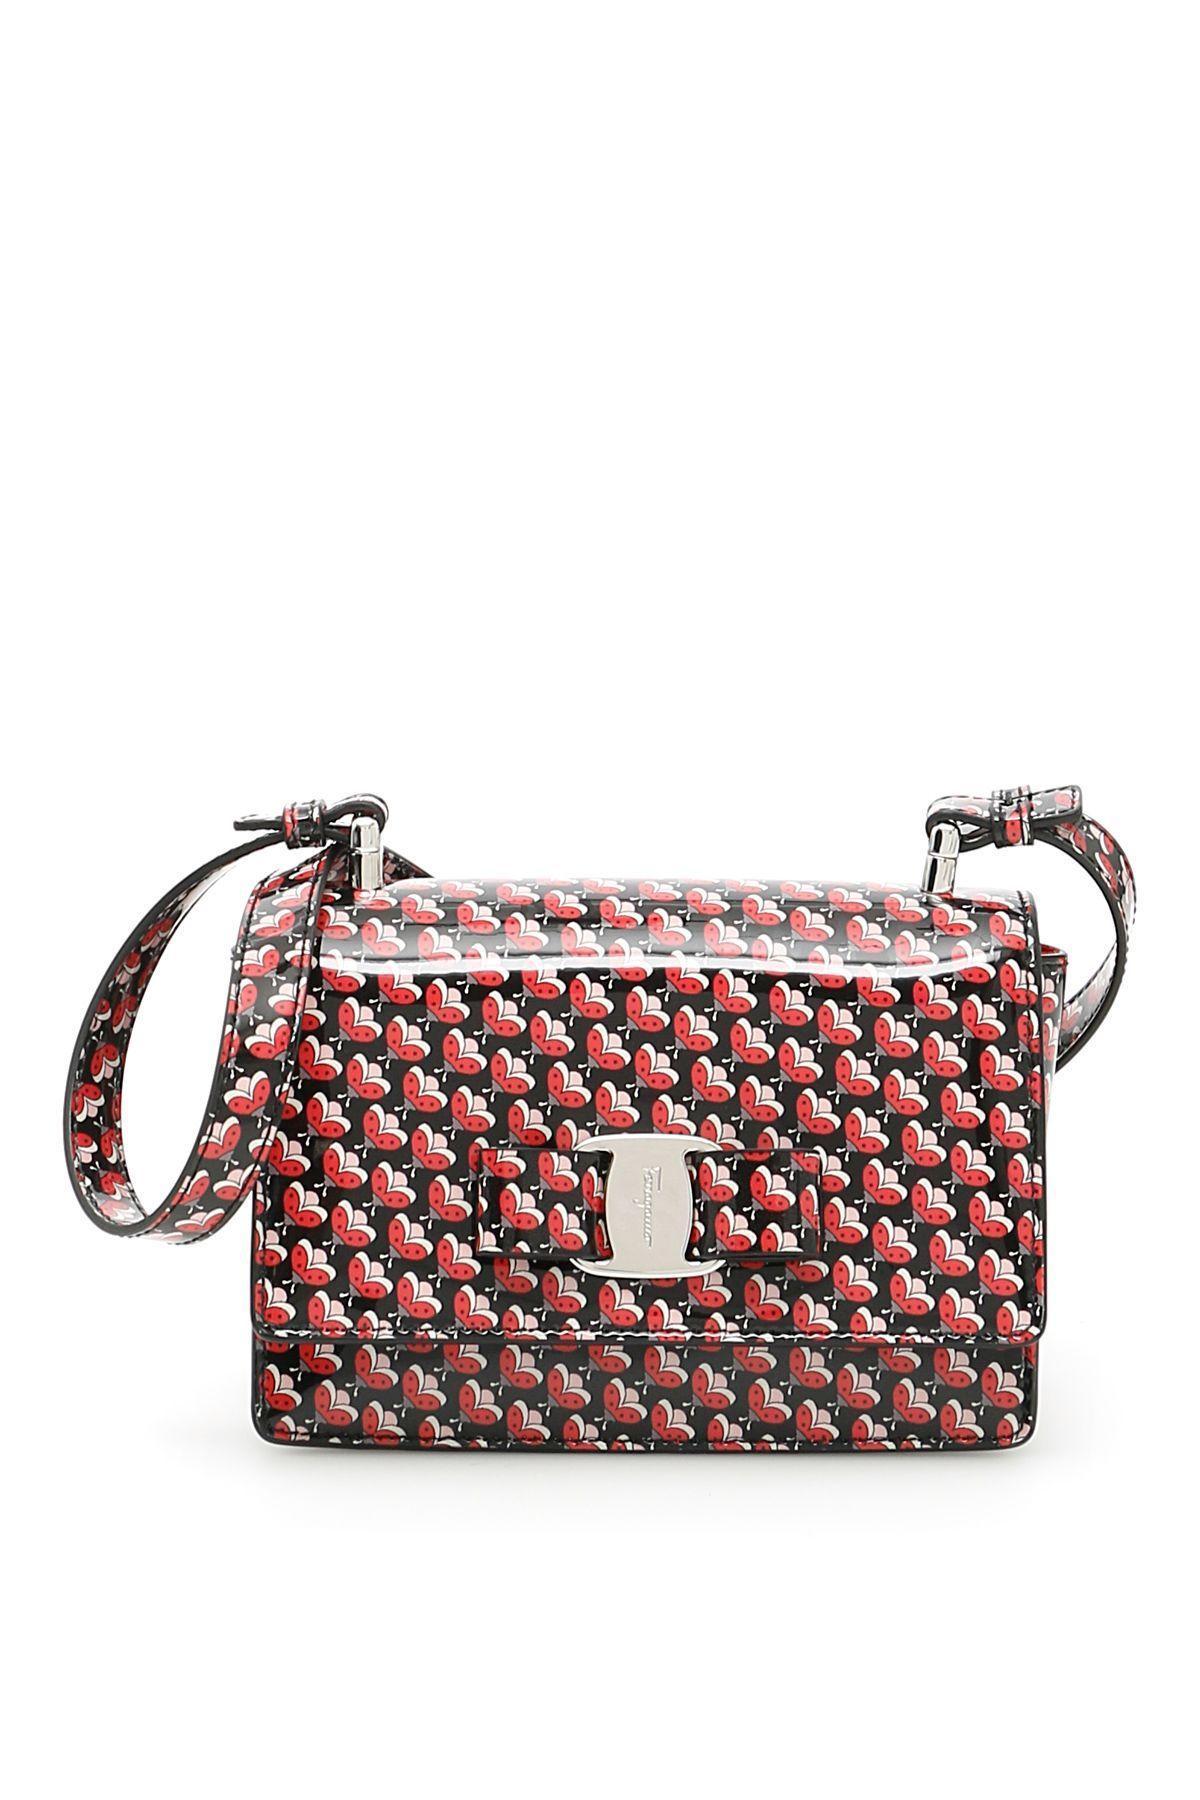 160904cfe60 SALVATORE FERRAGAMO MINI GINNY BAG.  salvatoreferragamo  bags  shoulder bags   leather